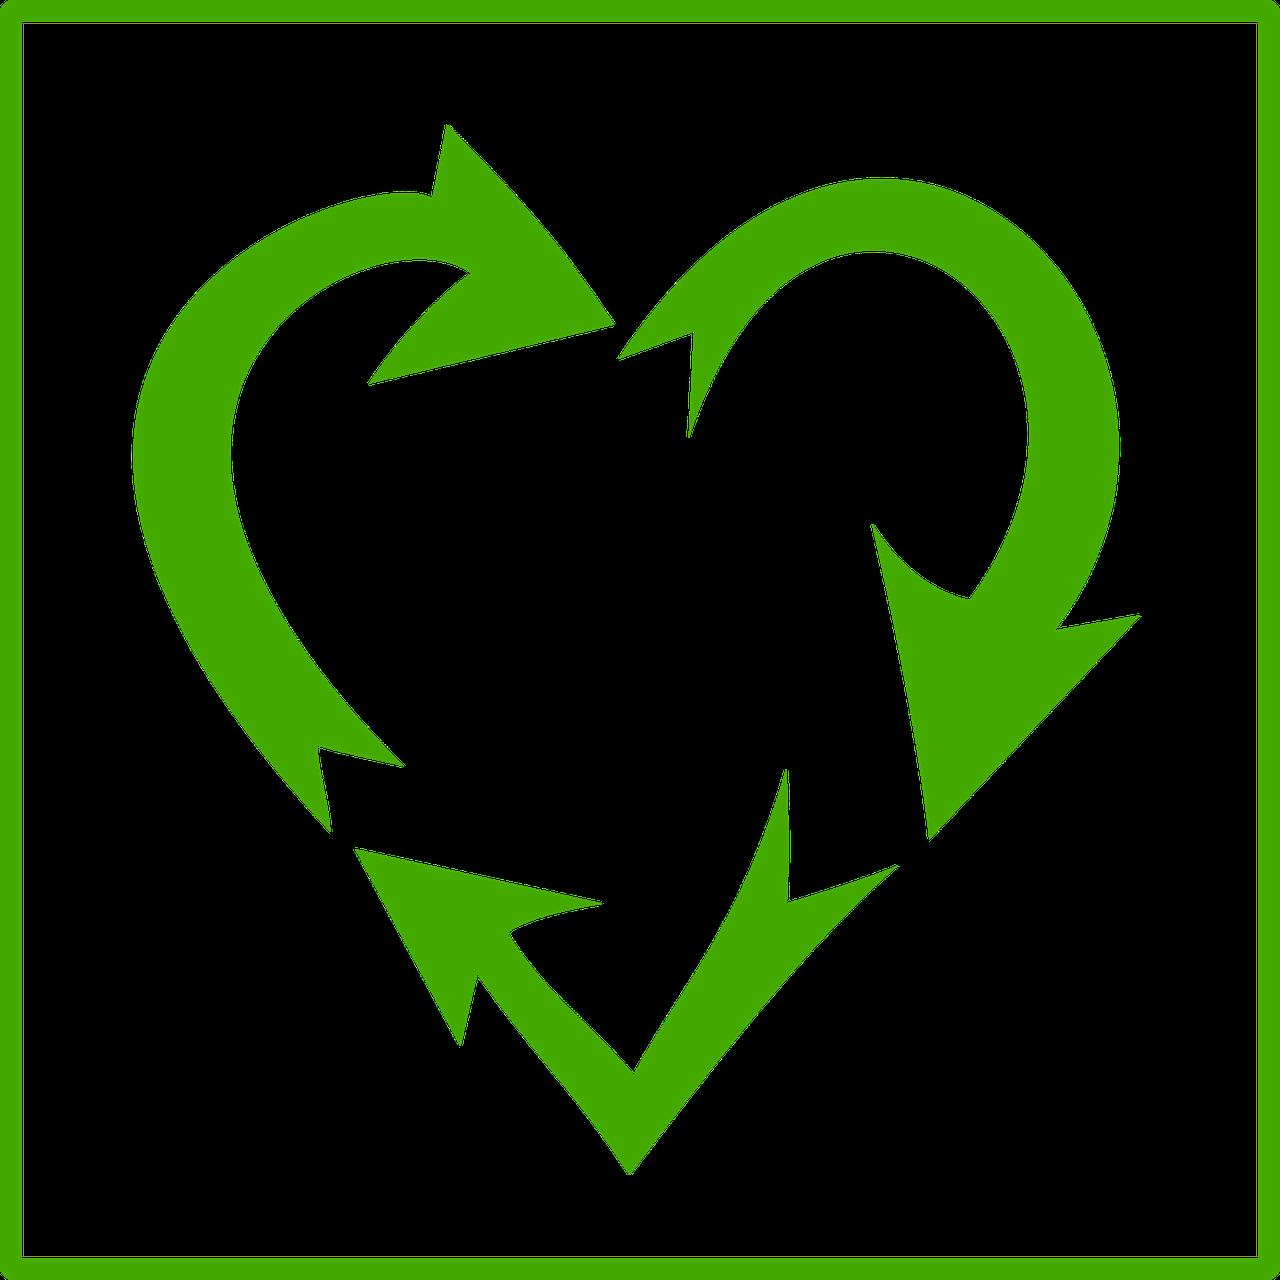 Recycling von Kunststoffgranulat